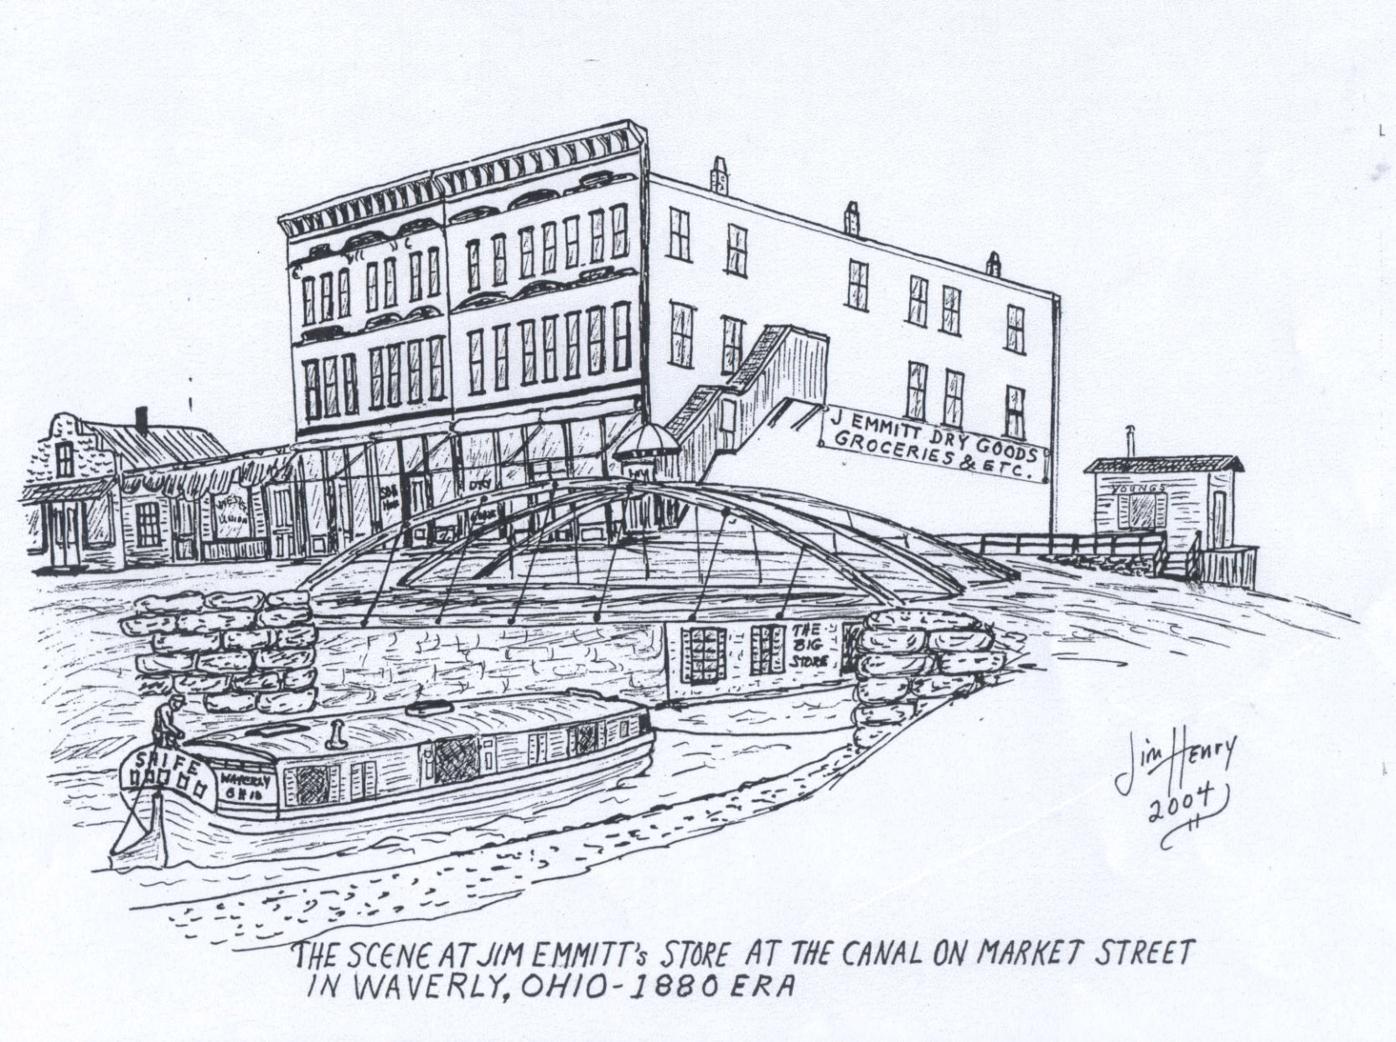 Jim Henry sketch - Canal and Greenbaum